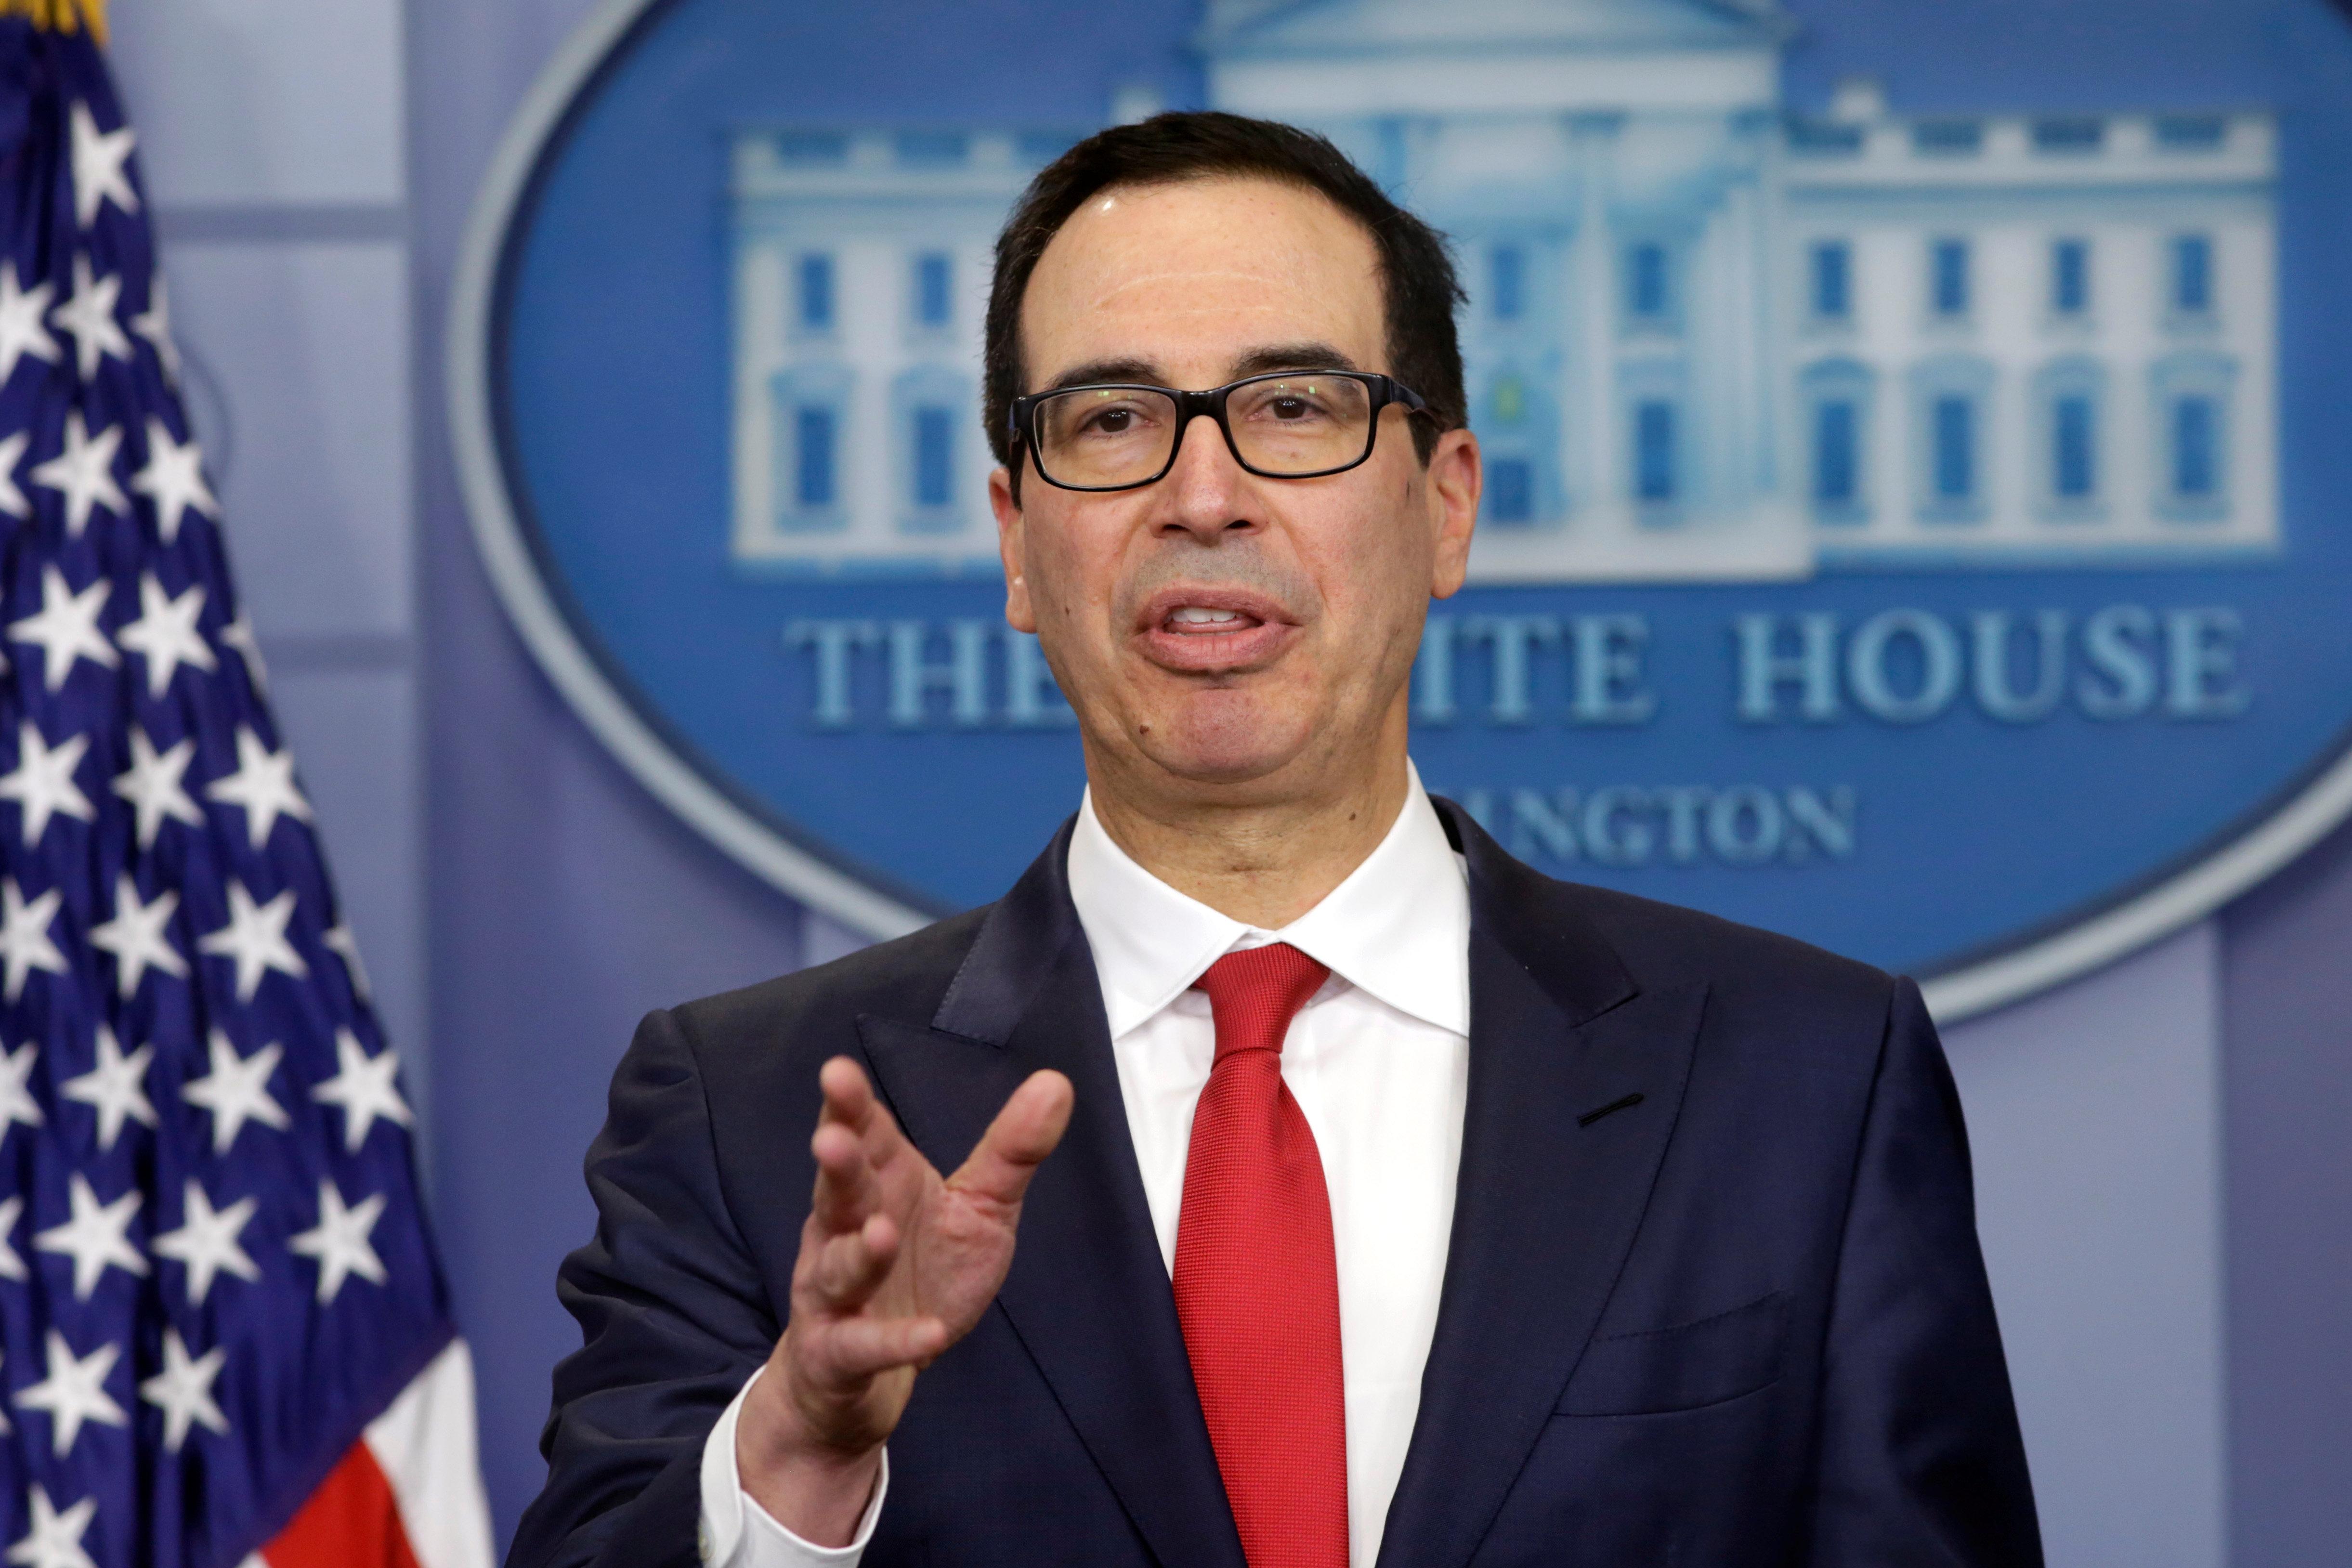 U.S. Treasury Secretary Steve Mnuchin speaks during a news briefing at the White House in Washington, U.S., to announce sanctions against Venezuela, August 25, 2017. REUTERS/Yuri Gripas